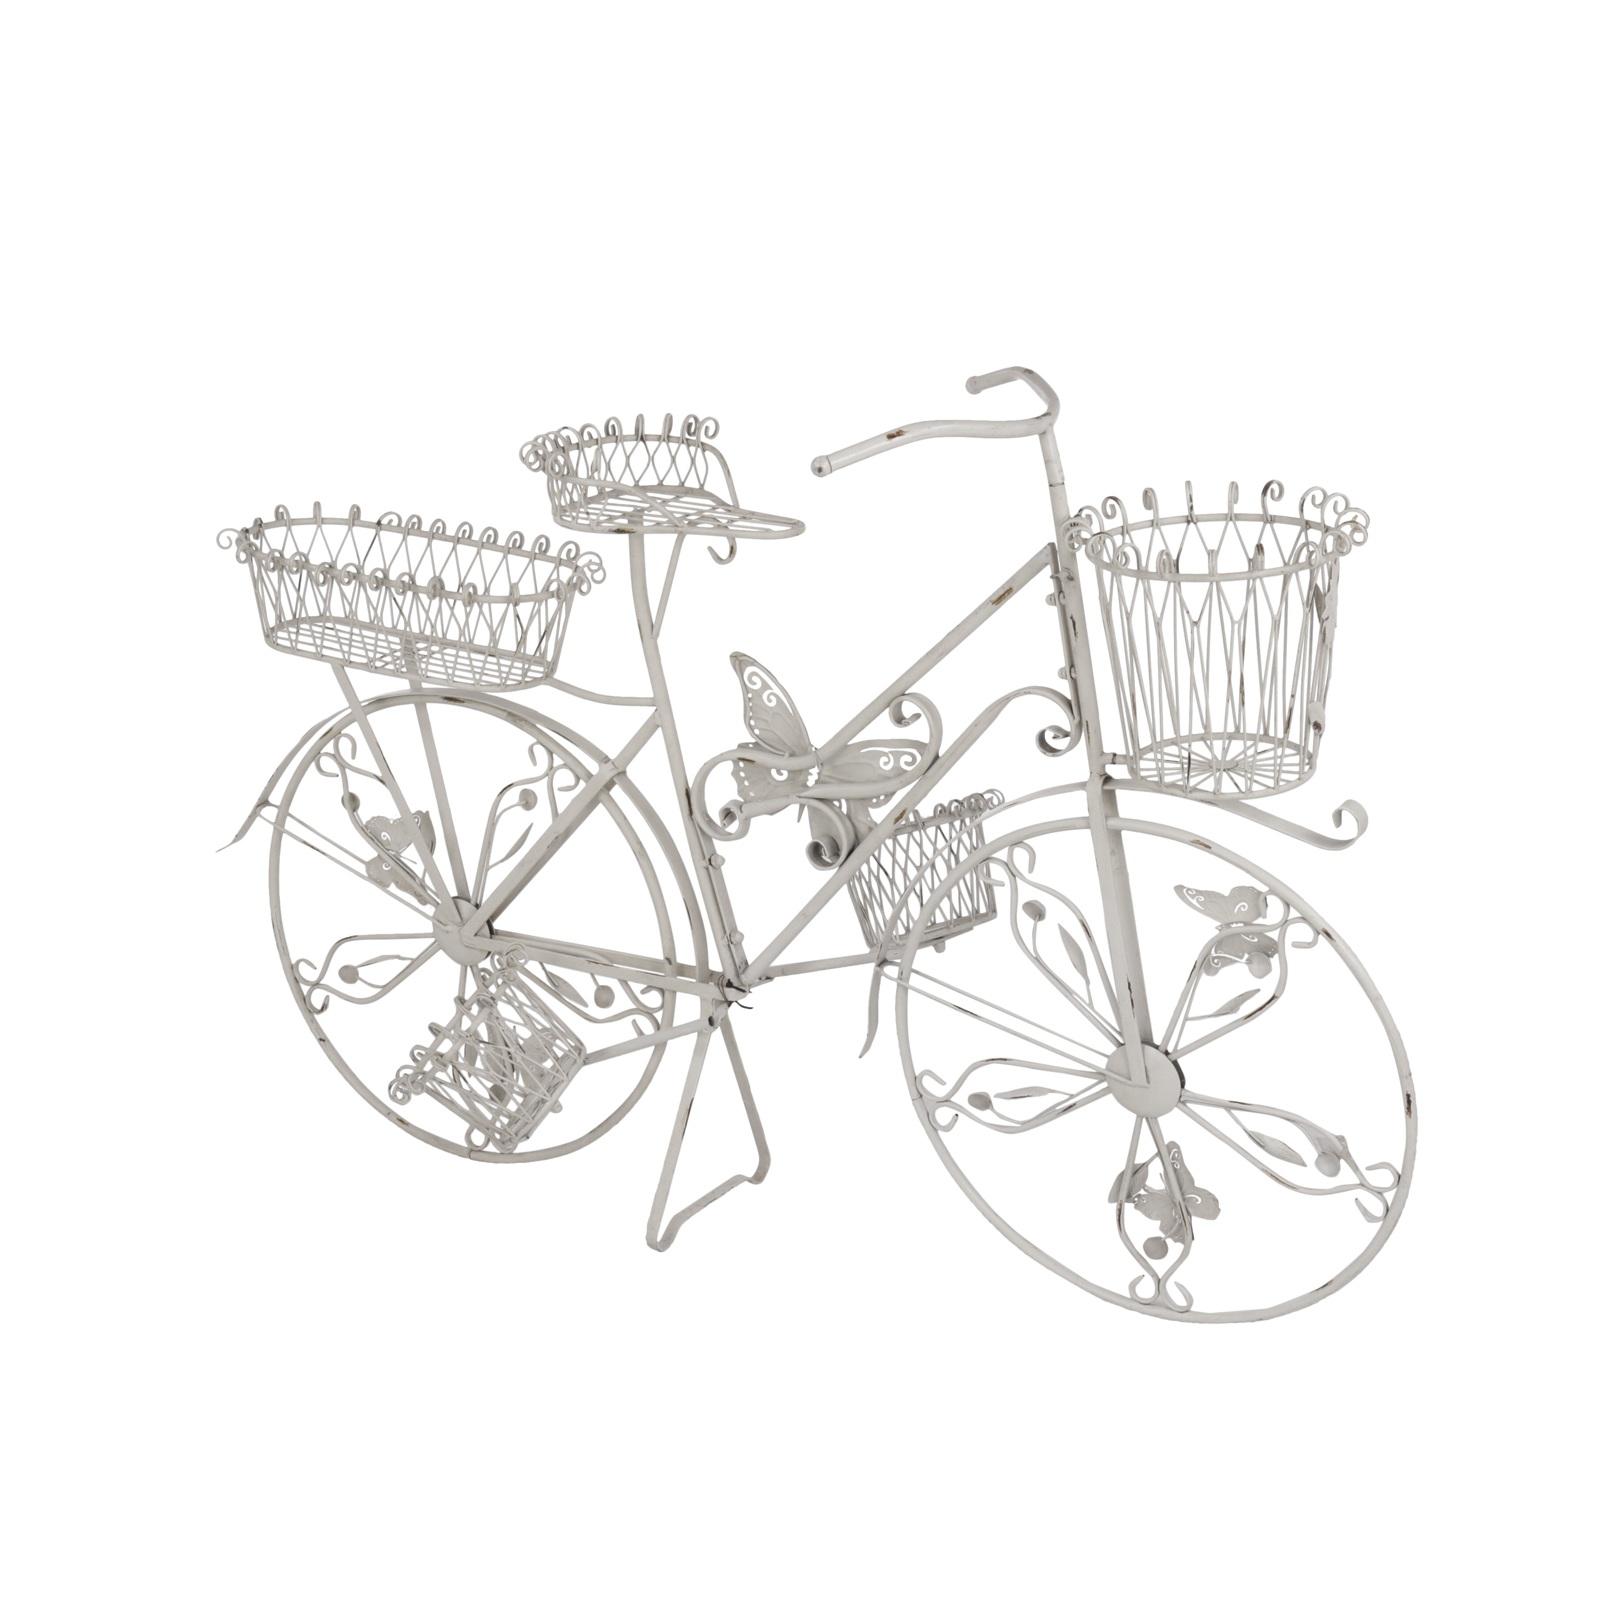 Vintage Bicycle (White)